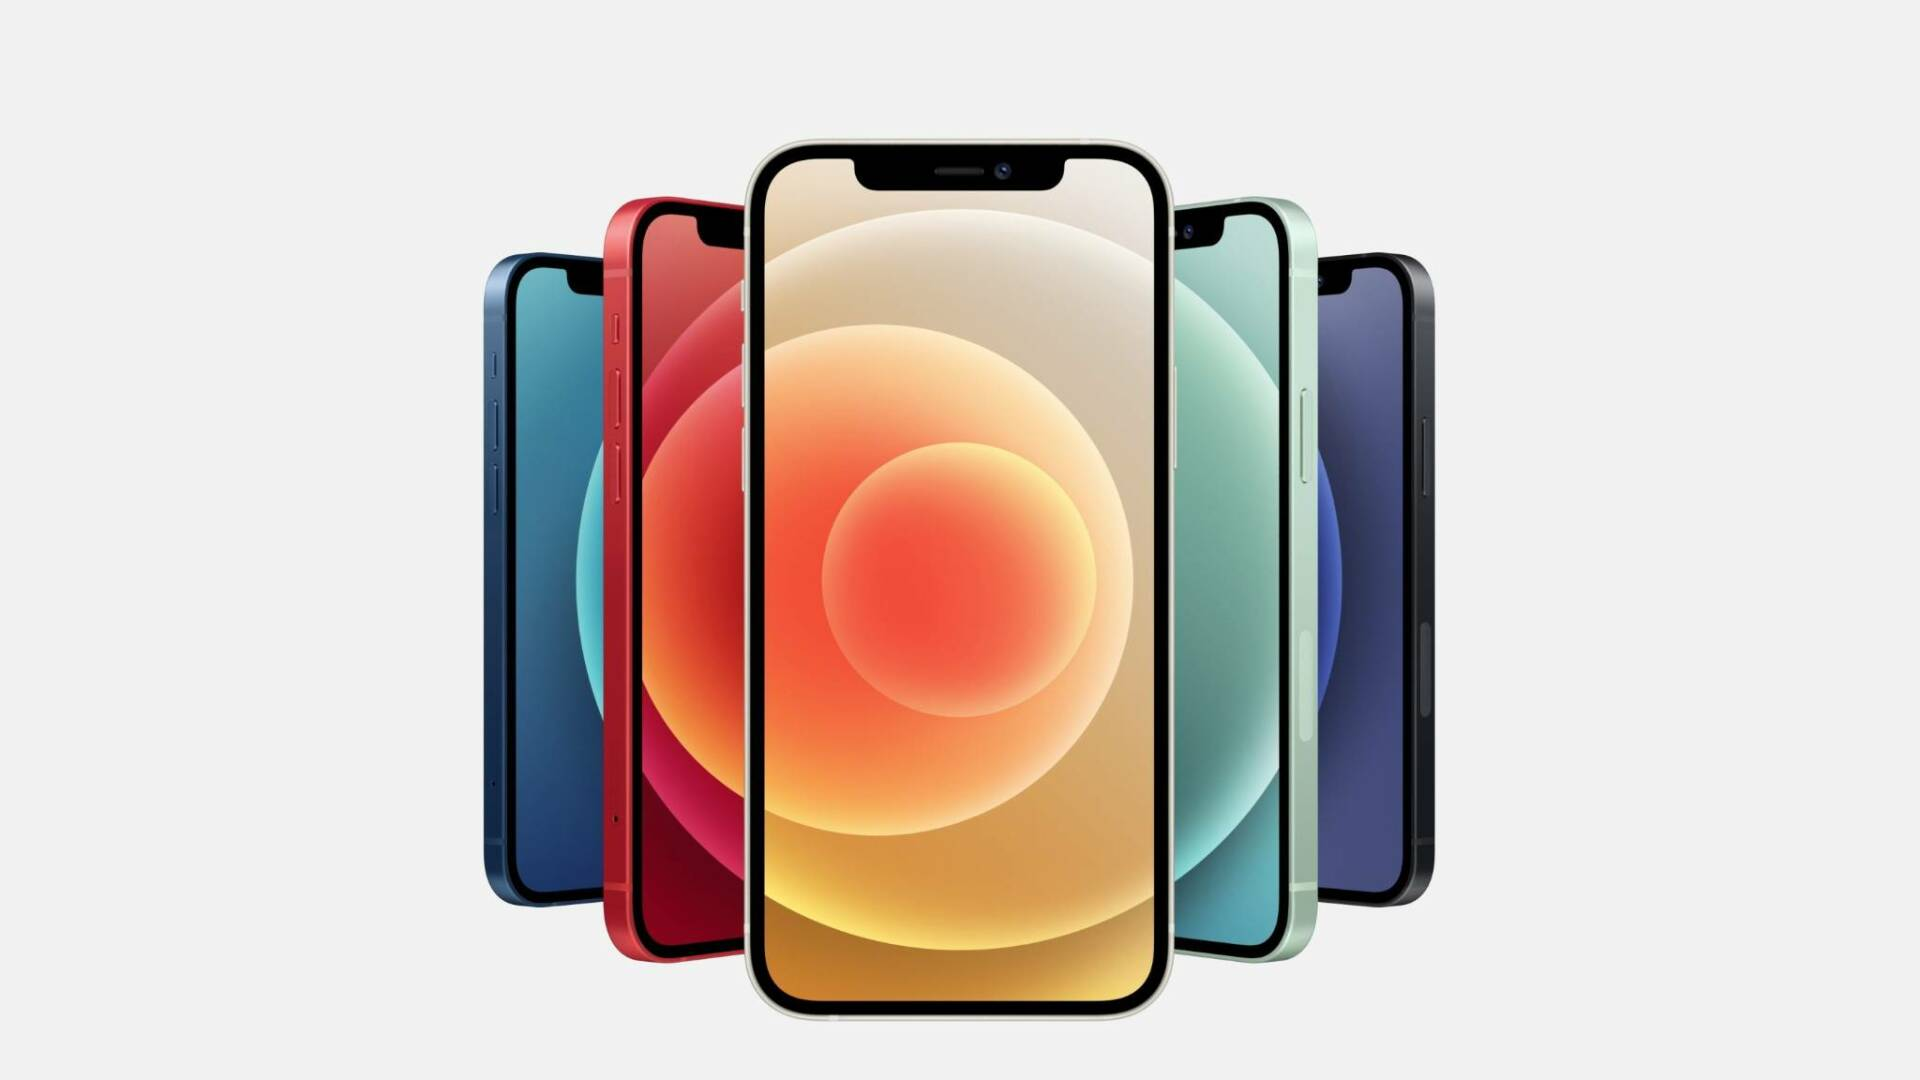 Apple iPhone 12 / Mini